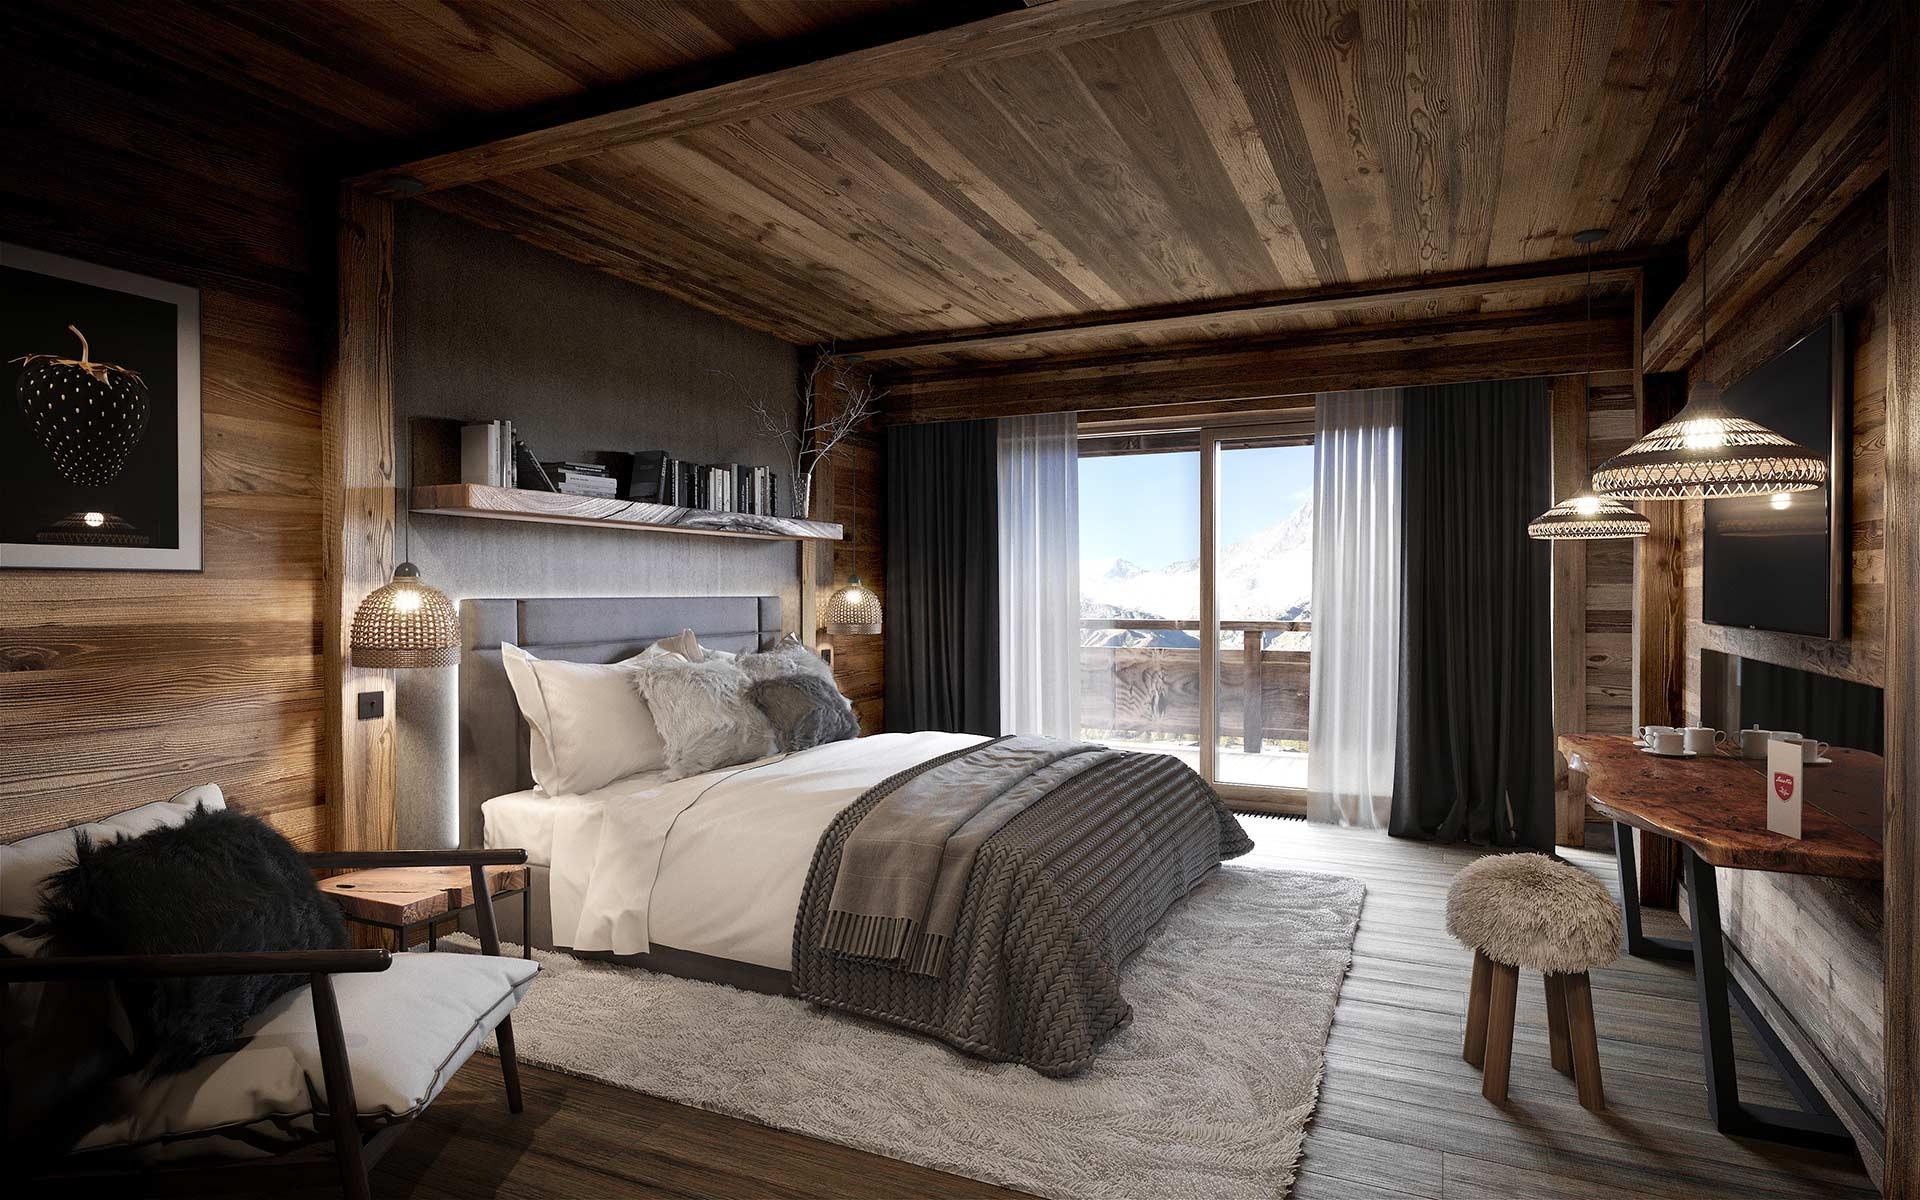 3D interior render creation for hotel promotion